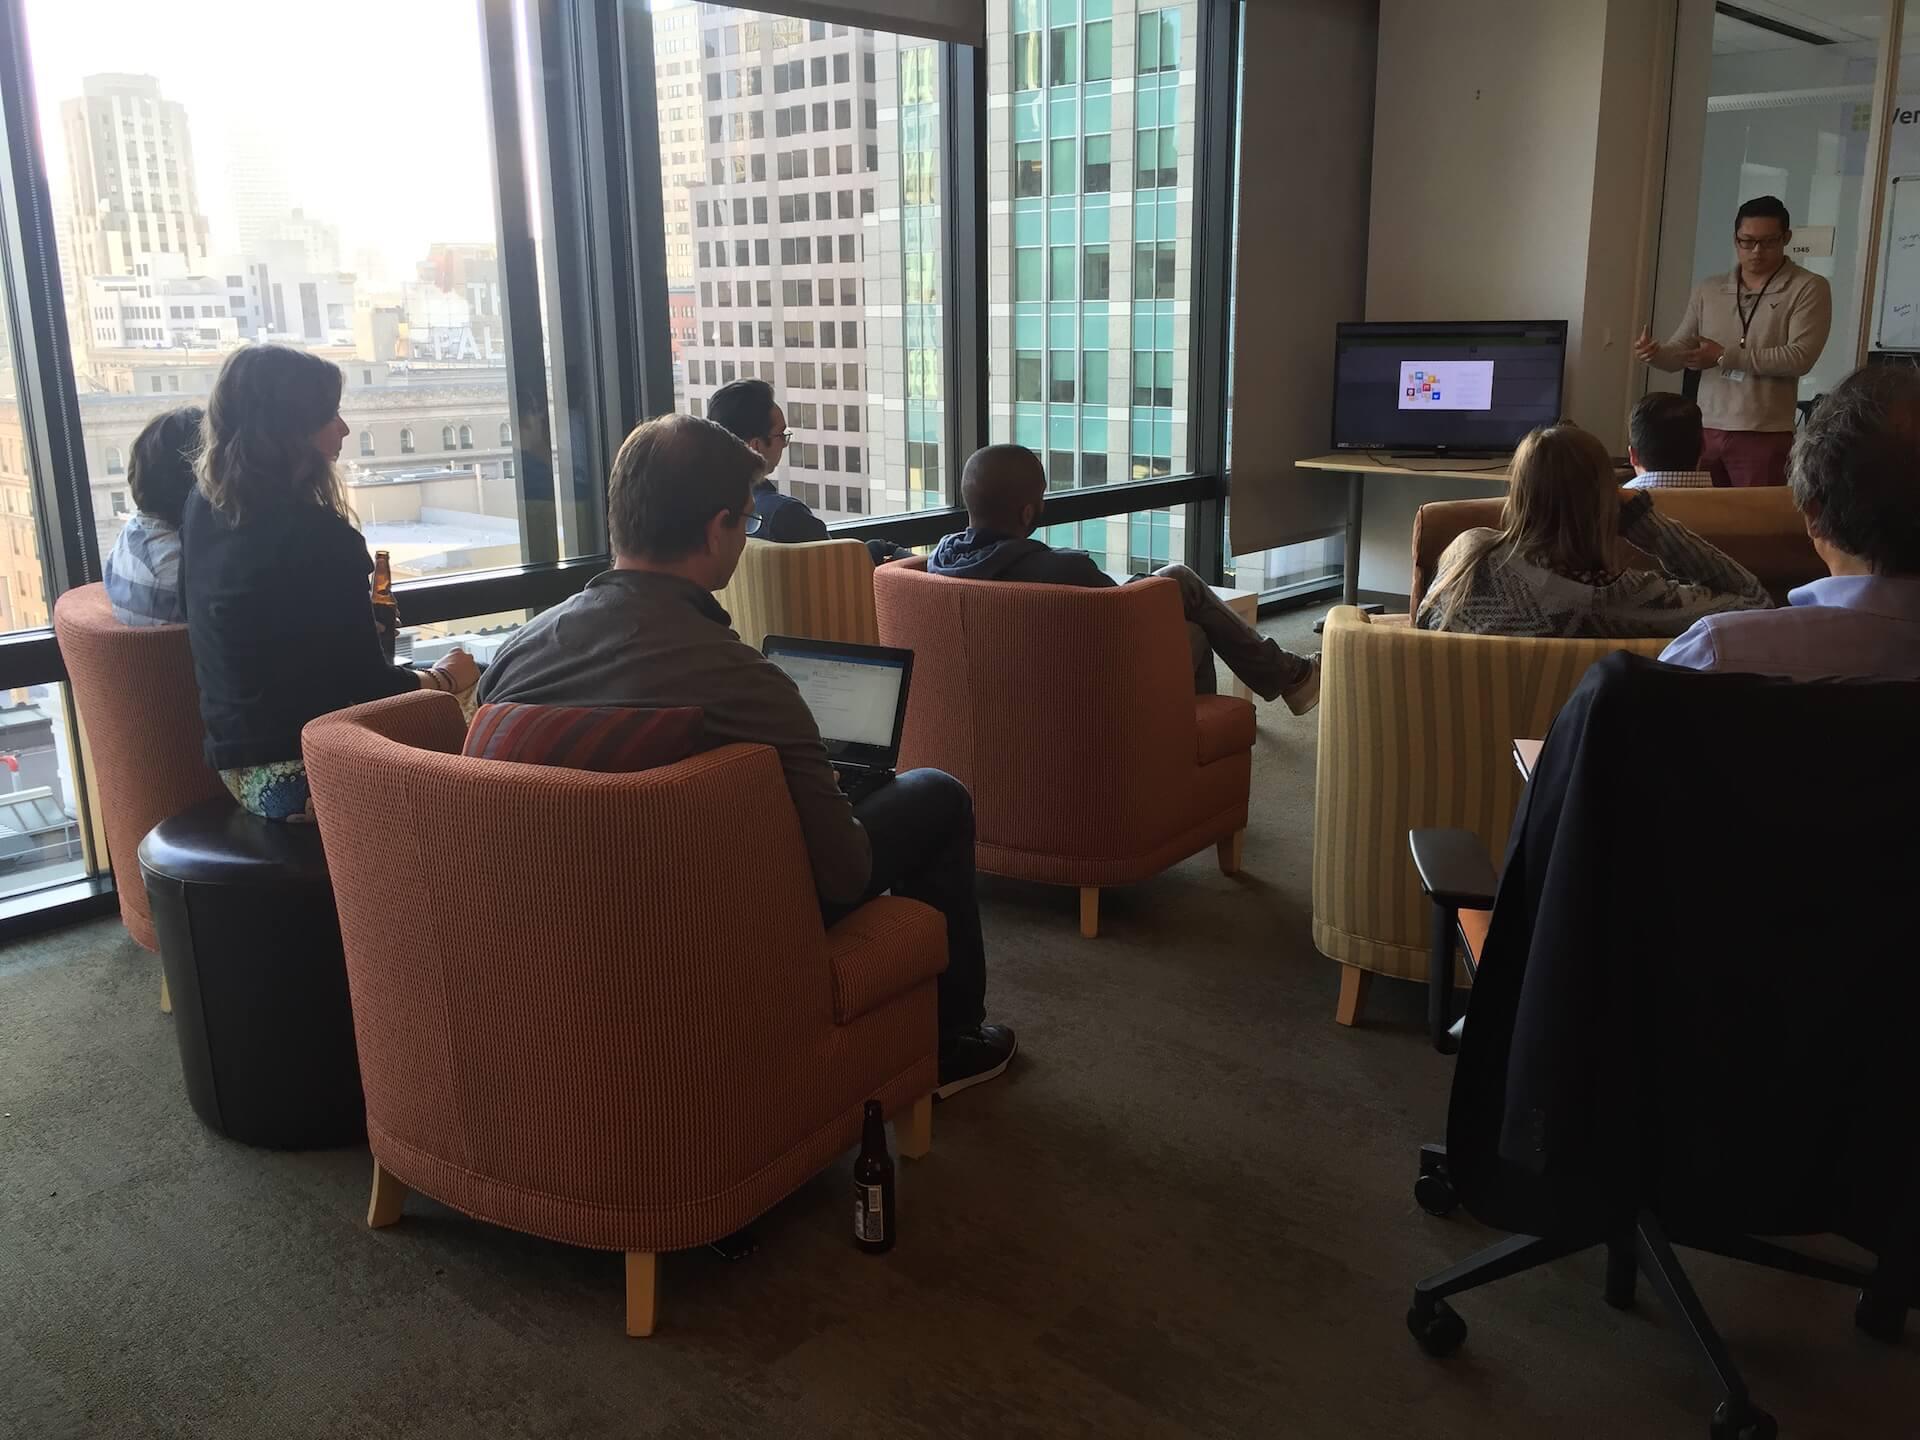 kintone developers network meetup build business apps brian